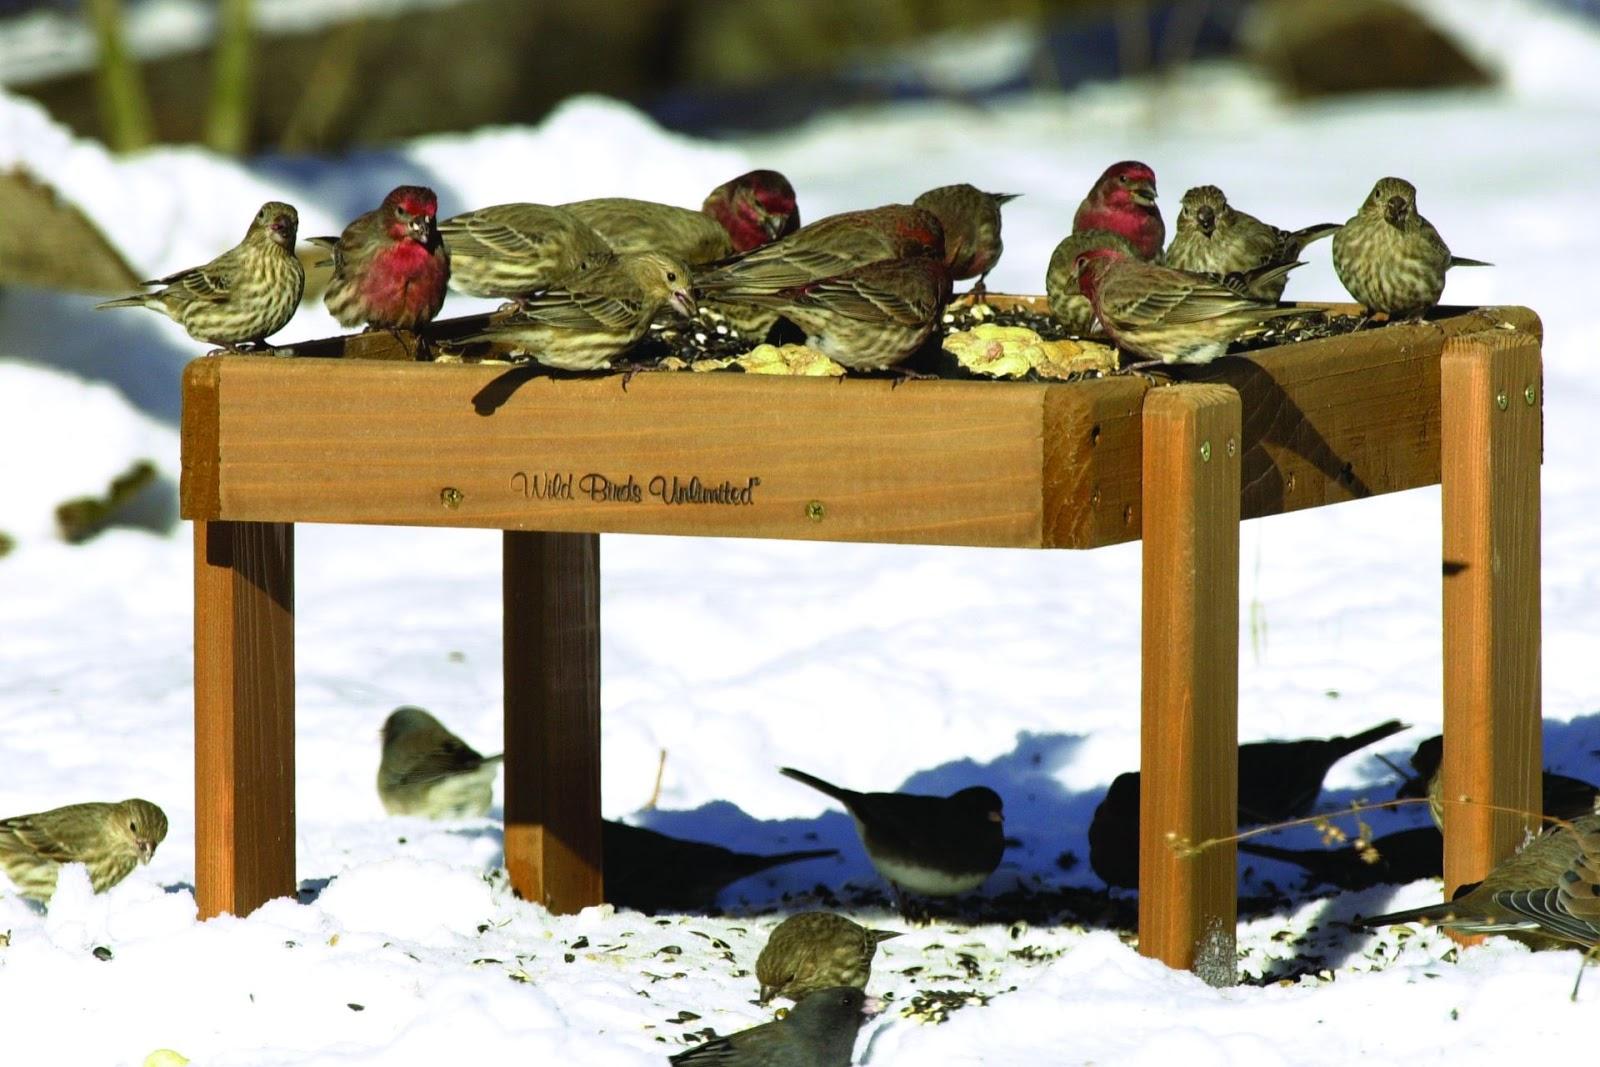 unlimited feeder id bird feeders media home facebook wild wildbirdsunlimitedhickorync birds